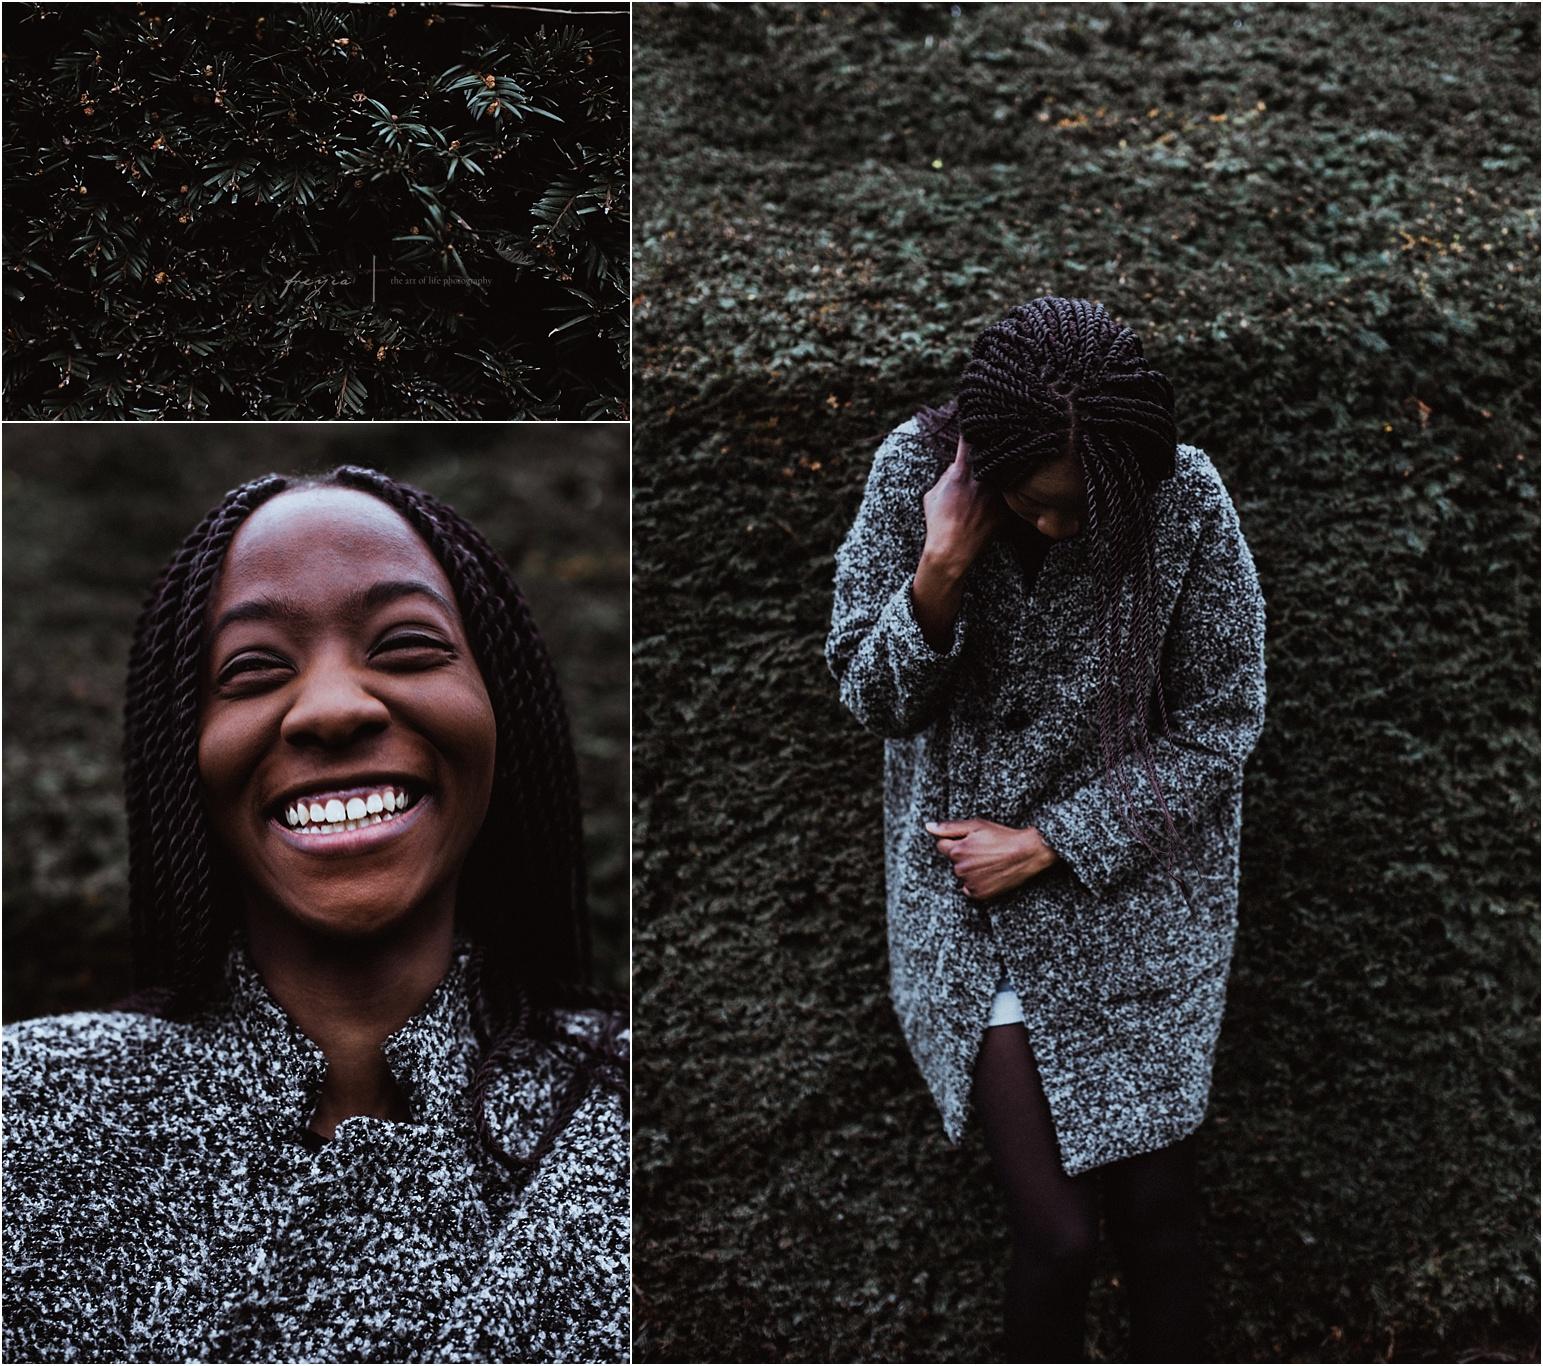 Marie-Aude portraits | FREYIA photography | photographe portrait mariage famille  | mode book plaisir projet personnel | PARIS Ile de France 75 92 | freyia freia freya freja freilla anna wator-2.jpg